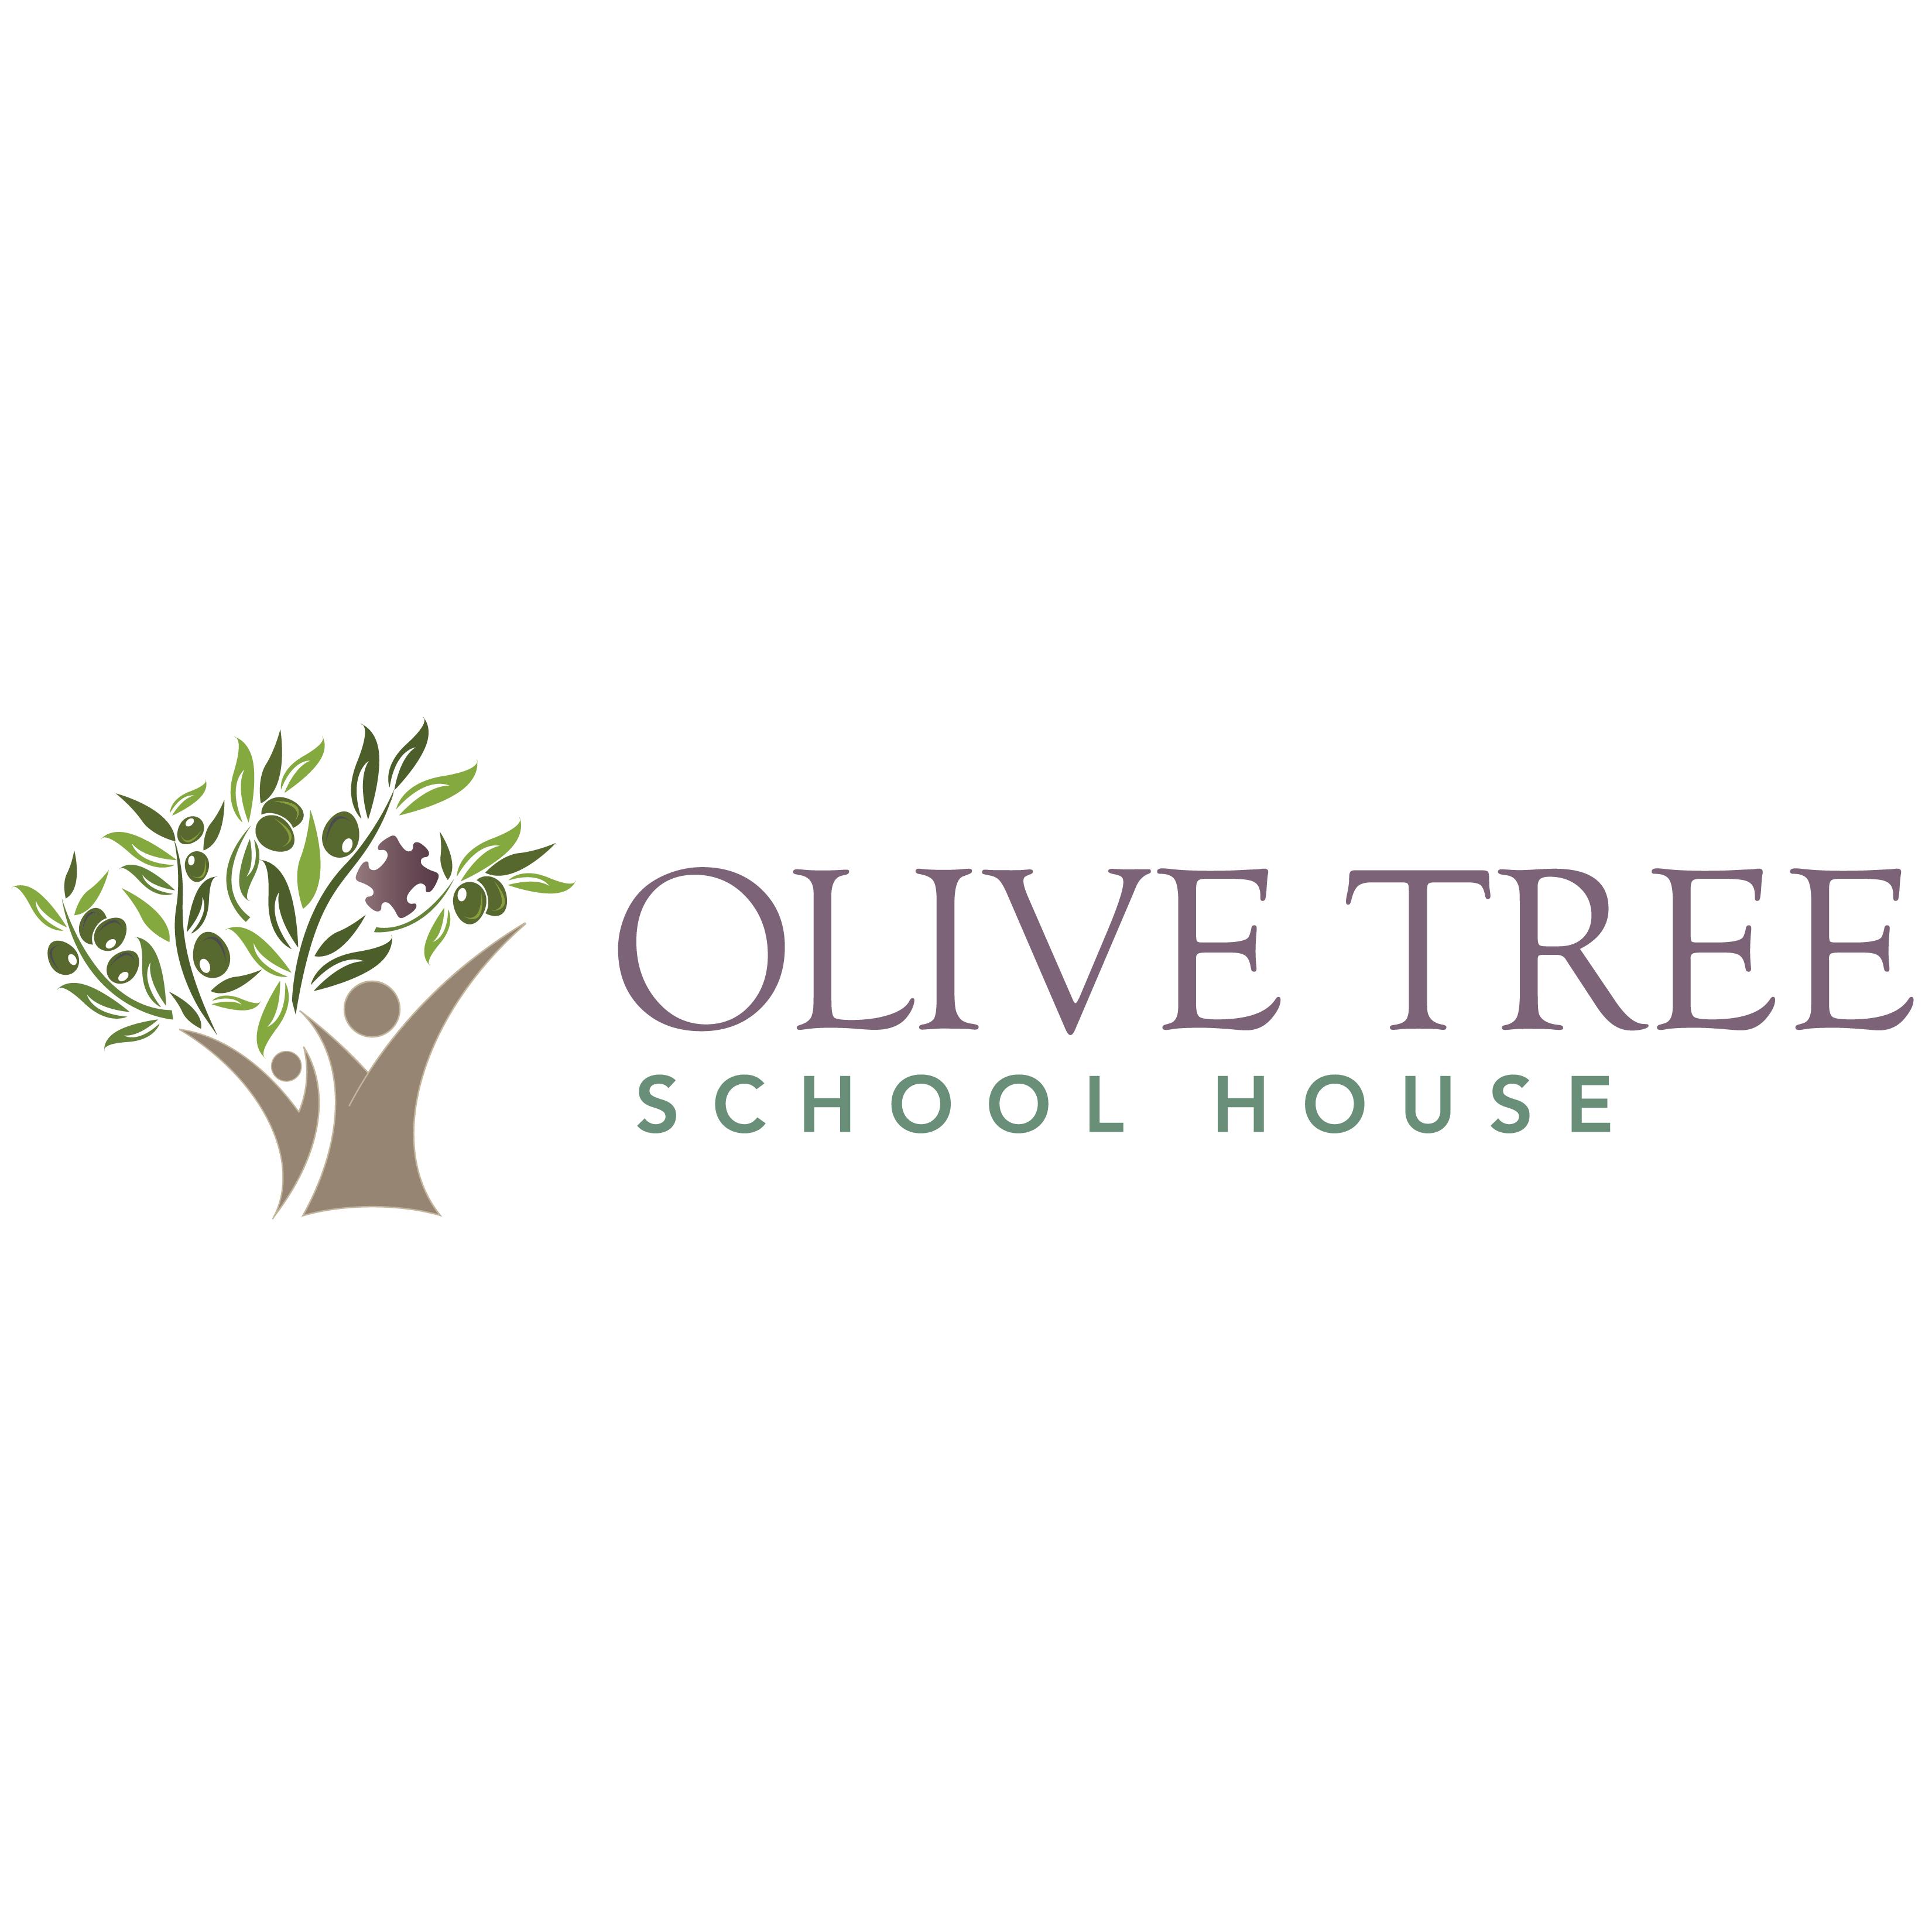 Olive Tree School House